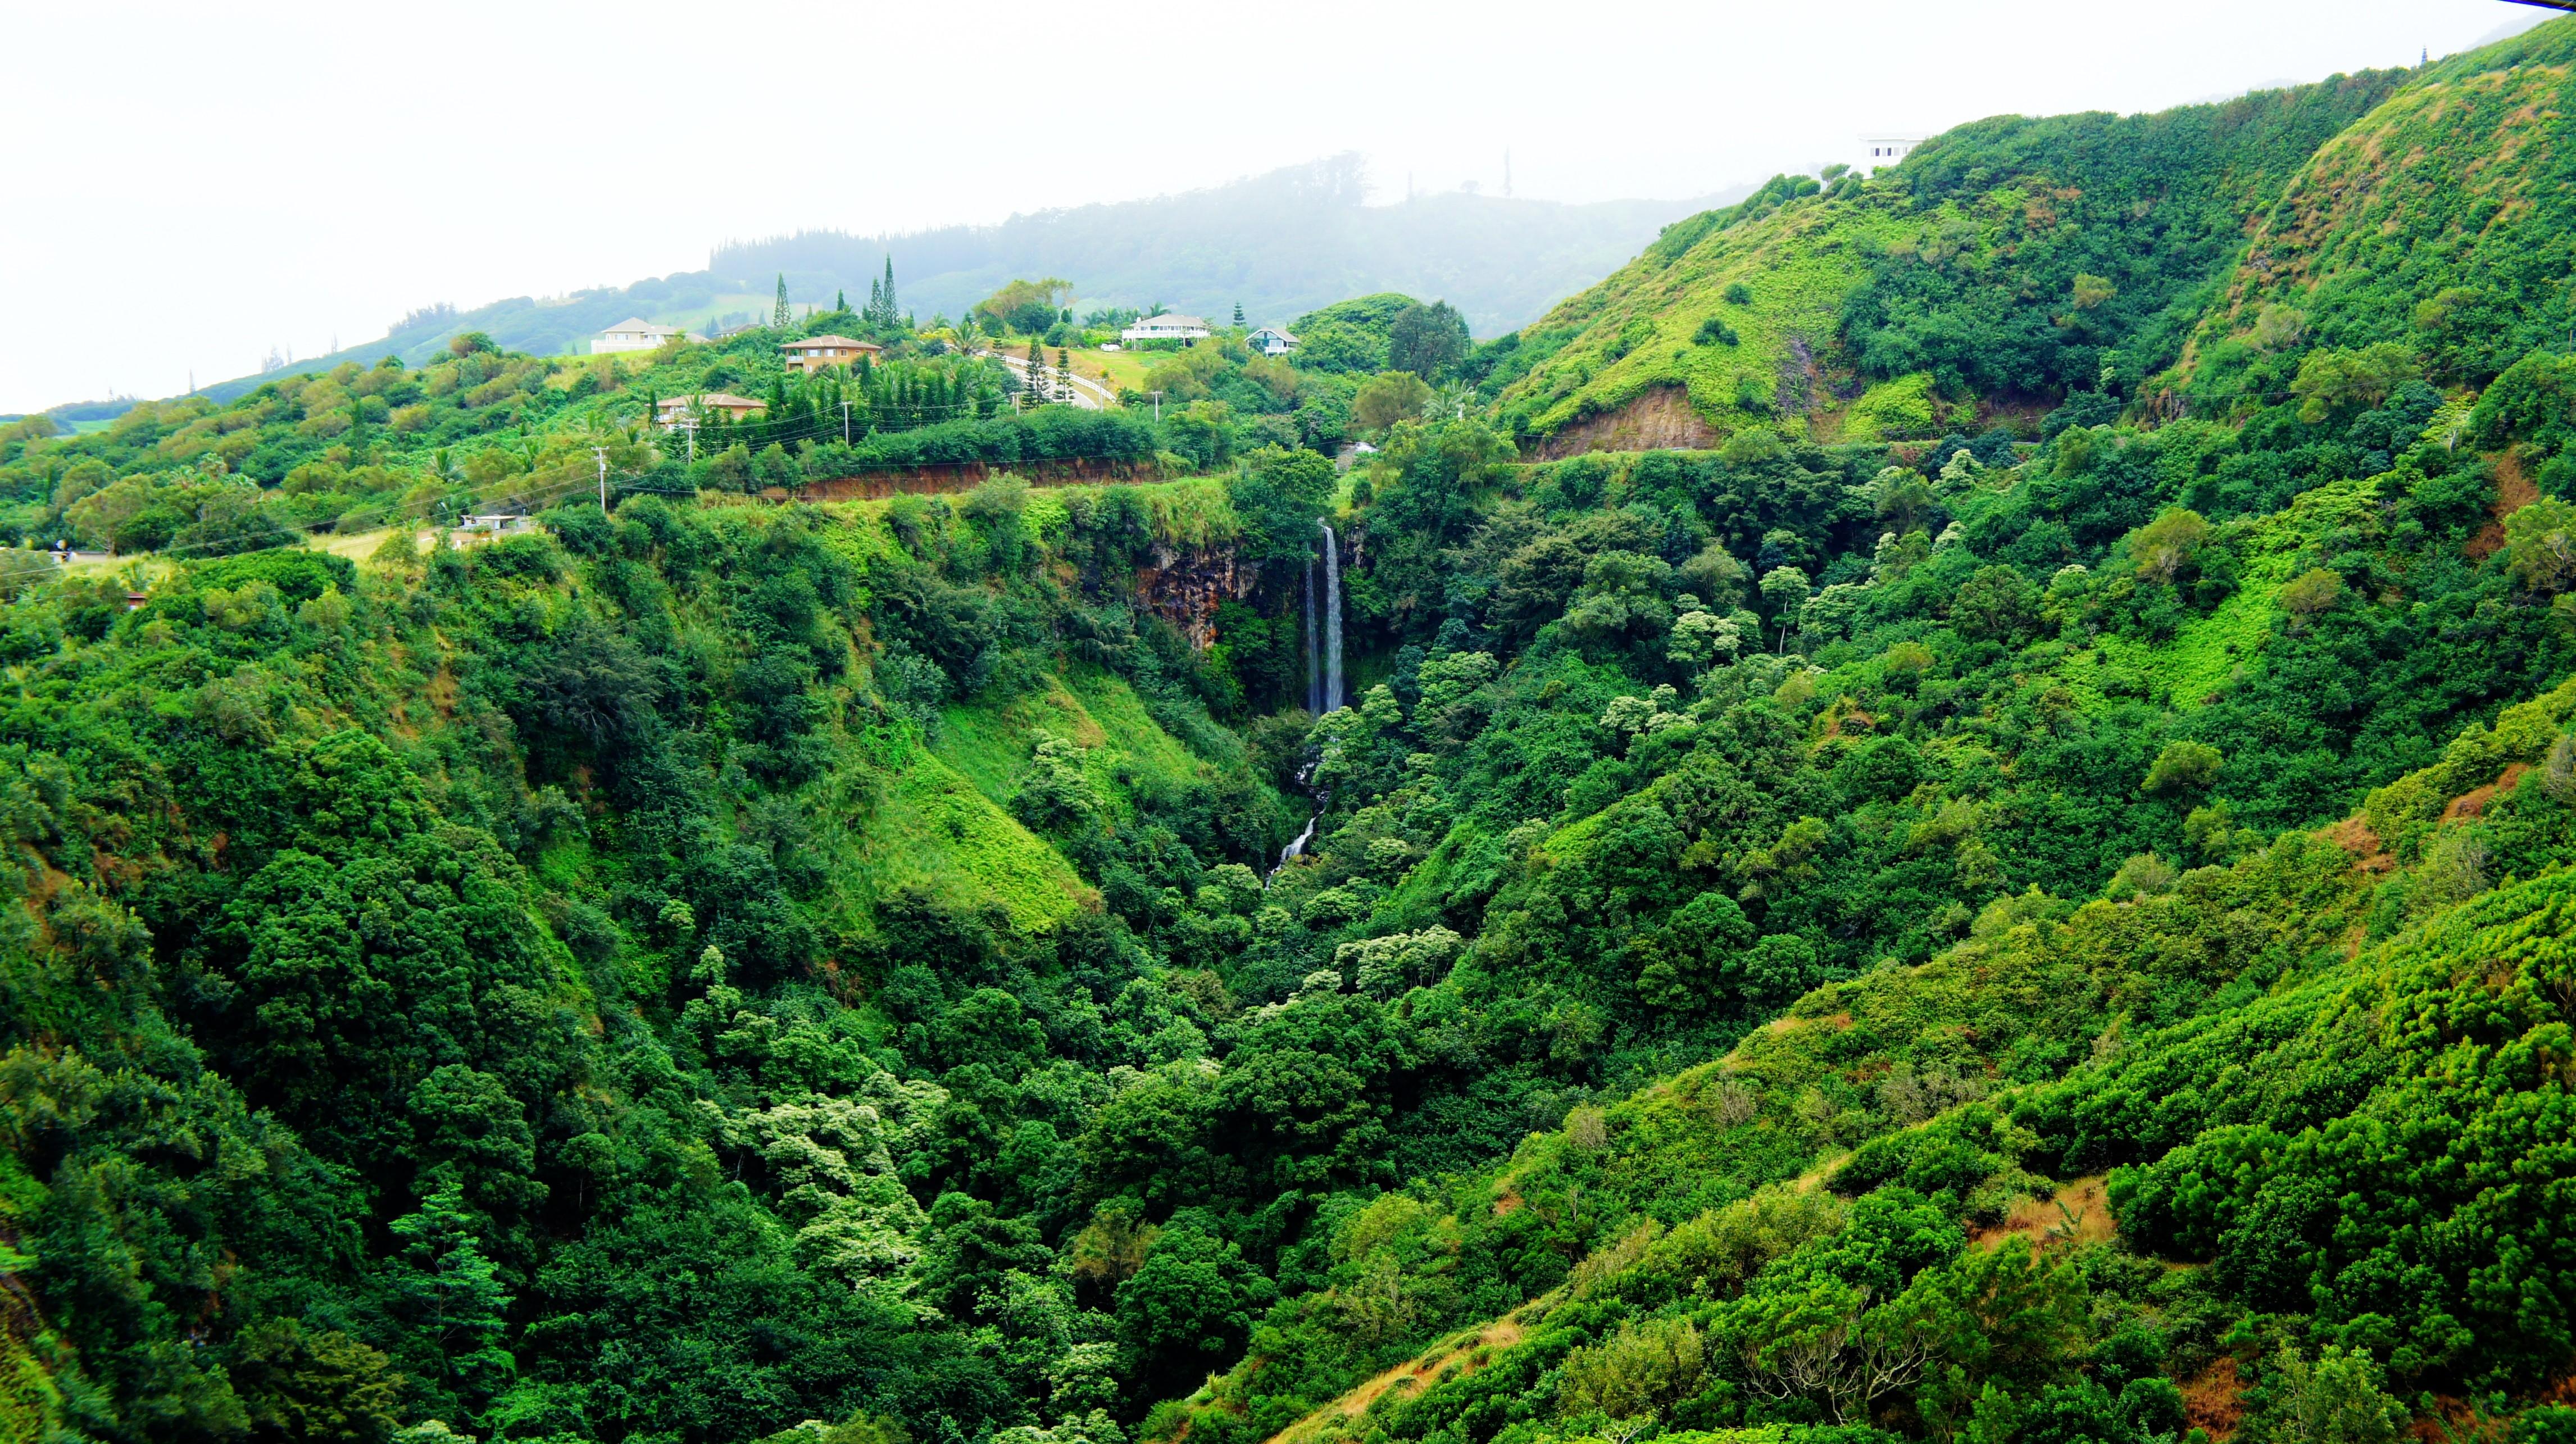 General 4585x2570 Hawaii Maui tropical forest tropics palm trees beach